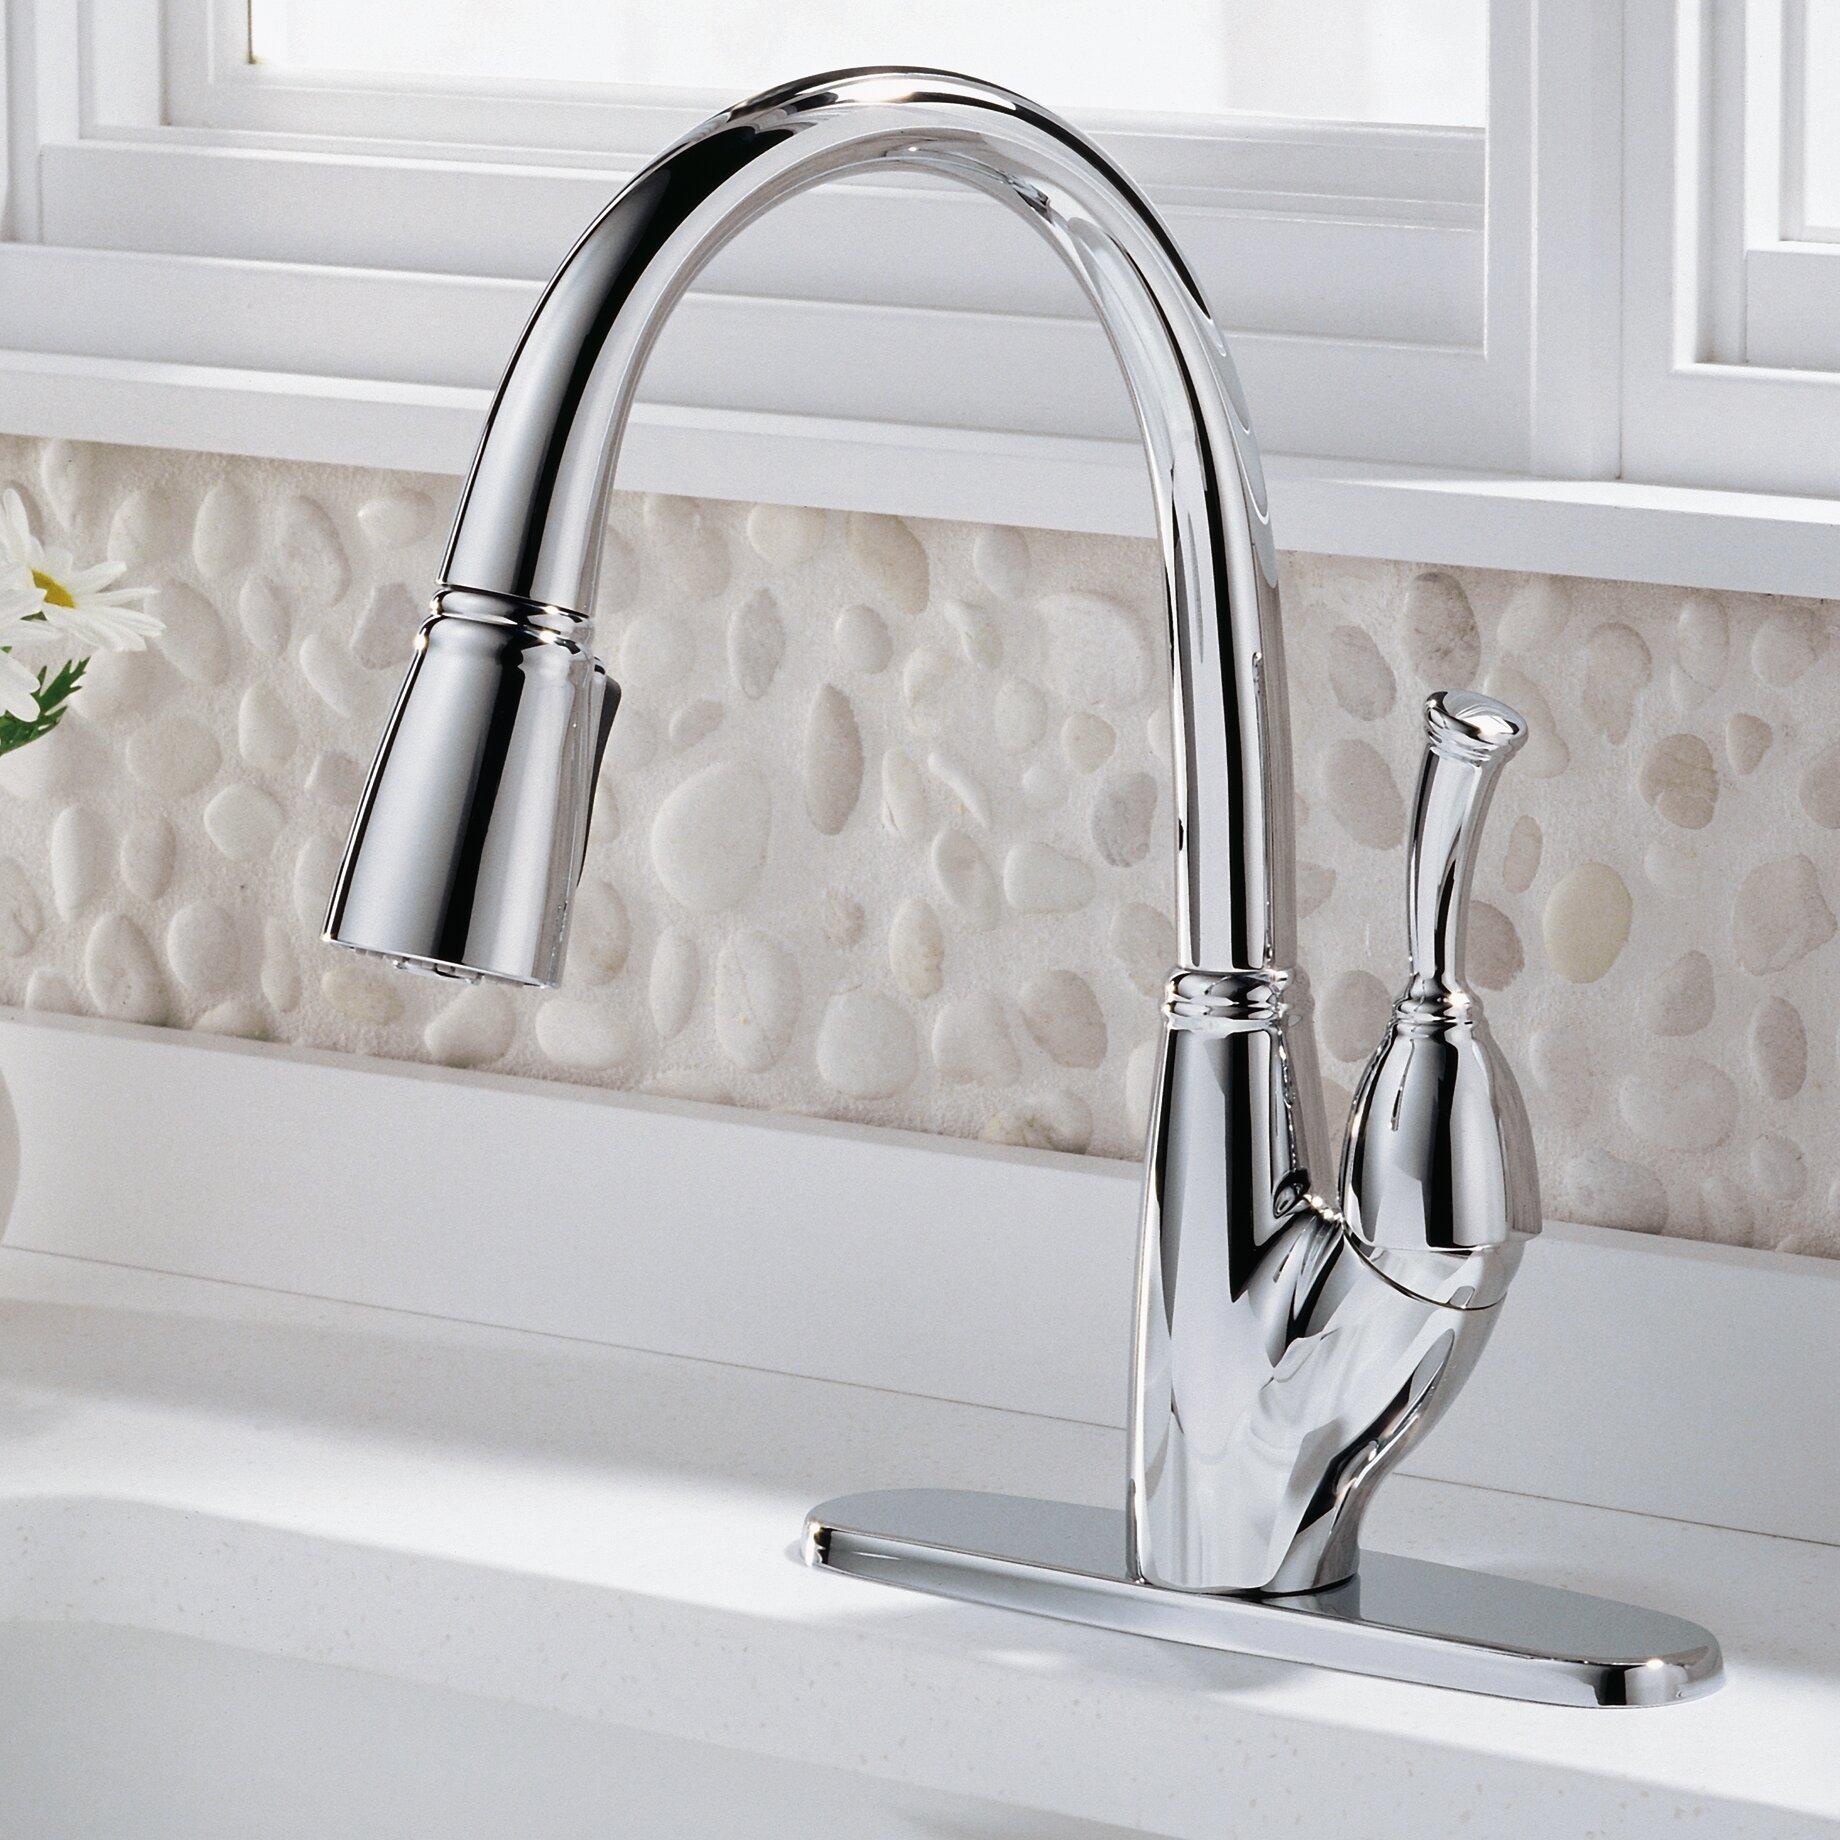 delta allora single handle deck mounted kitchen faucet delta allora touchless single handle deck mounted bar